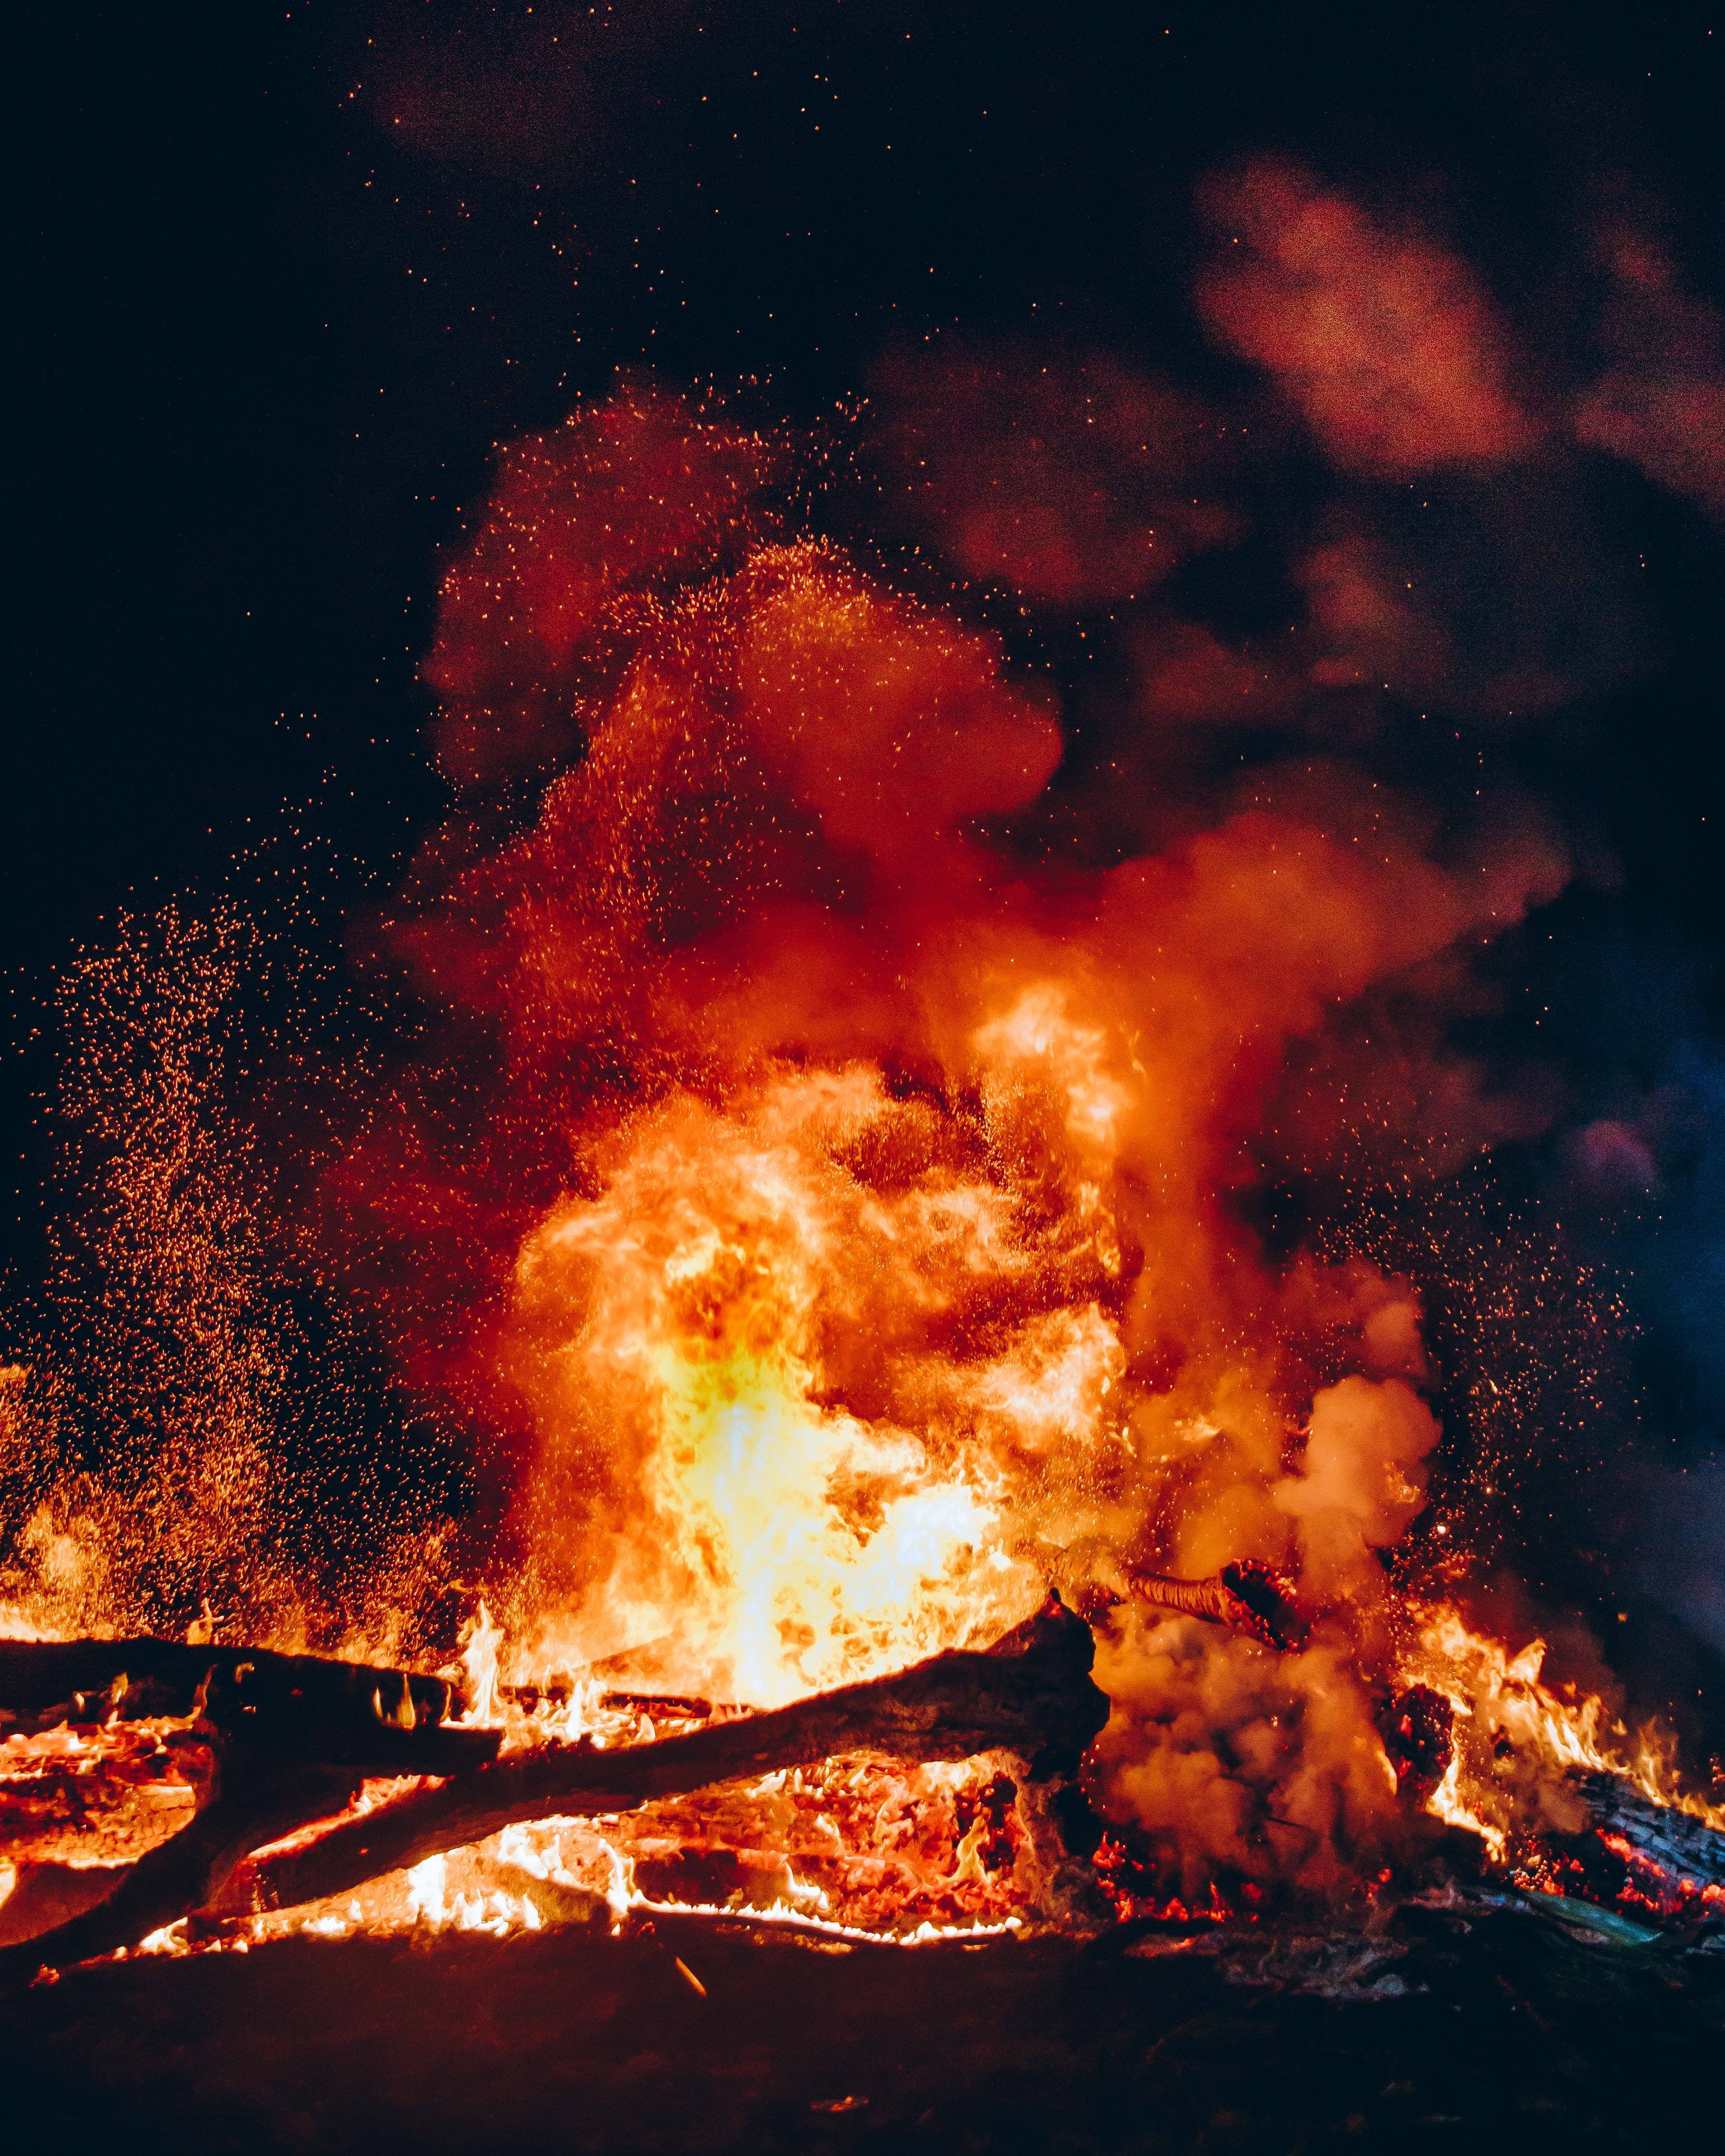 Burning pain stories